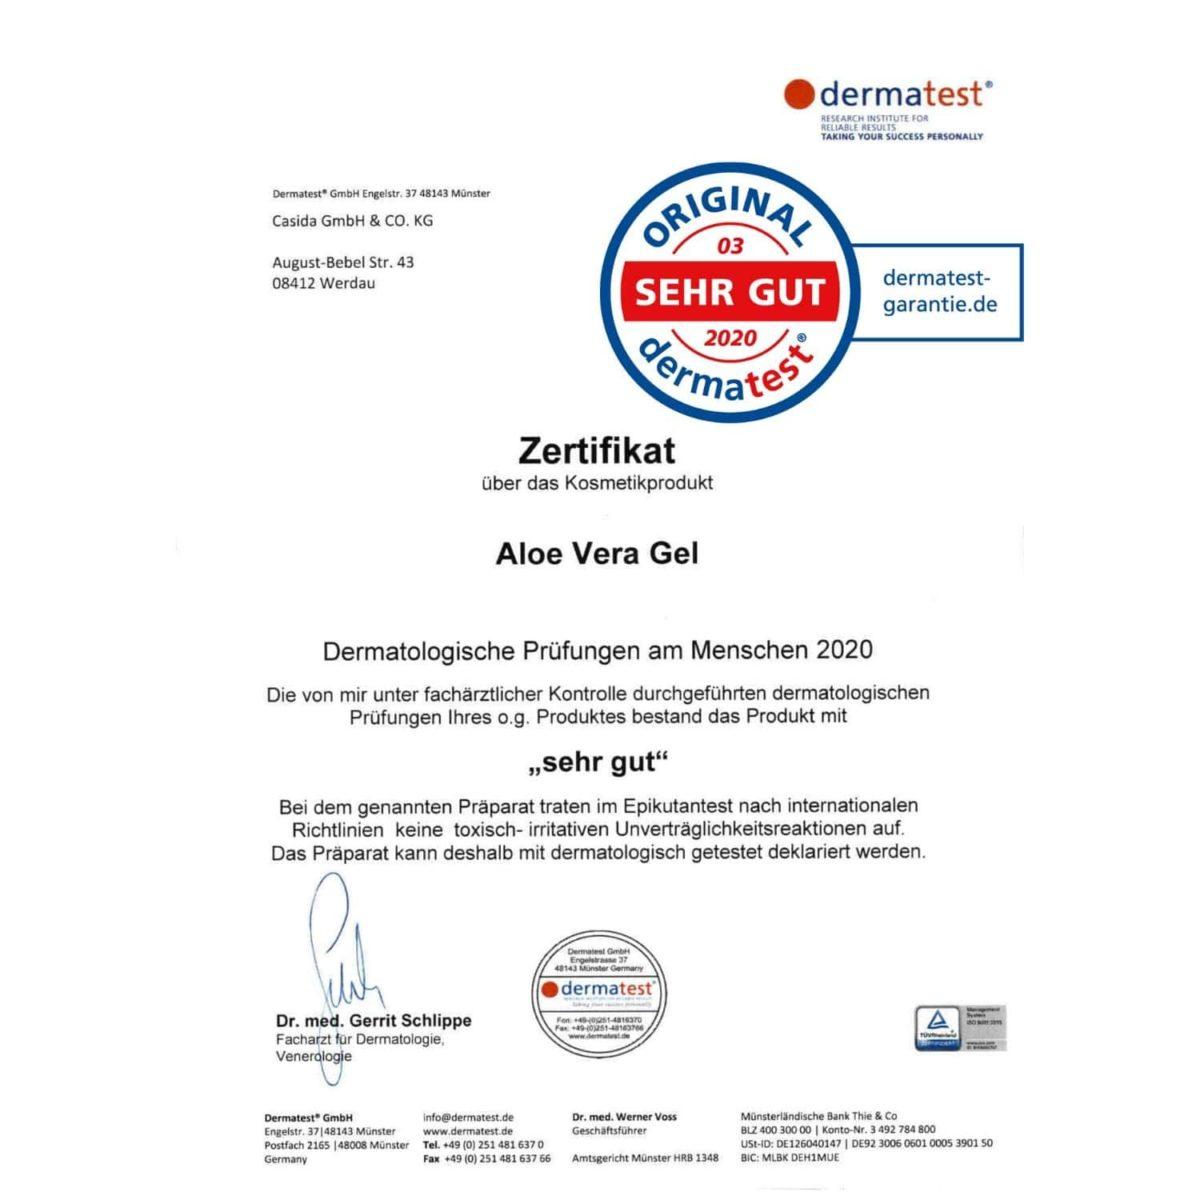 Dermatest Testsieger Aloe Vera Gel Apotheke PZN 16573212